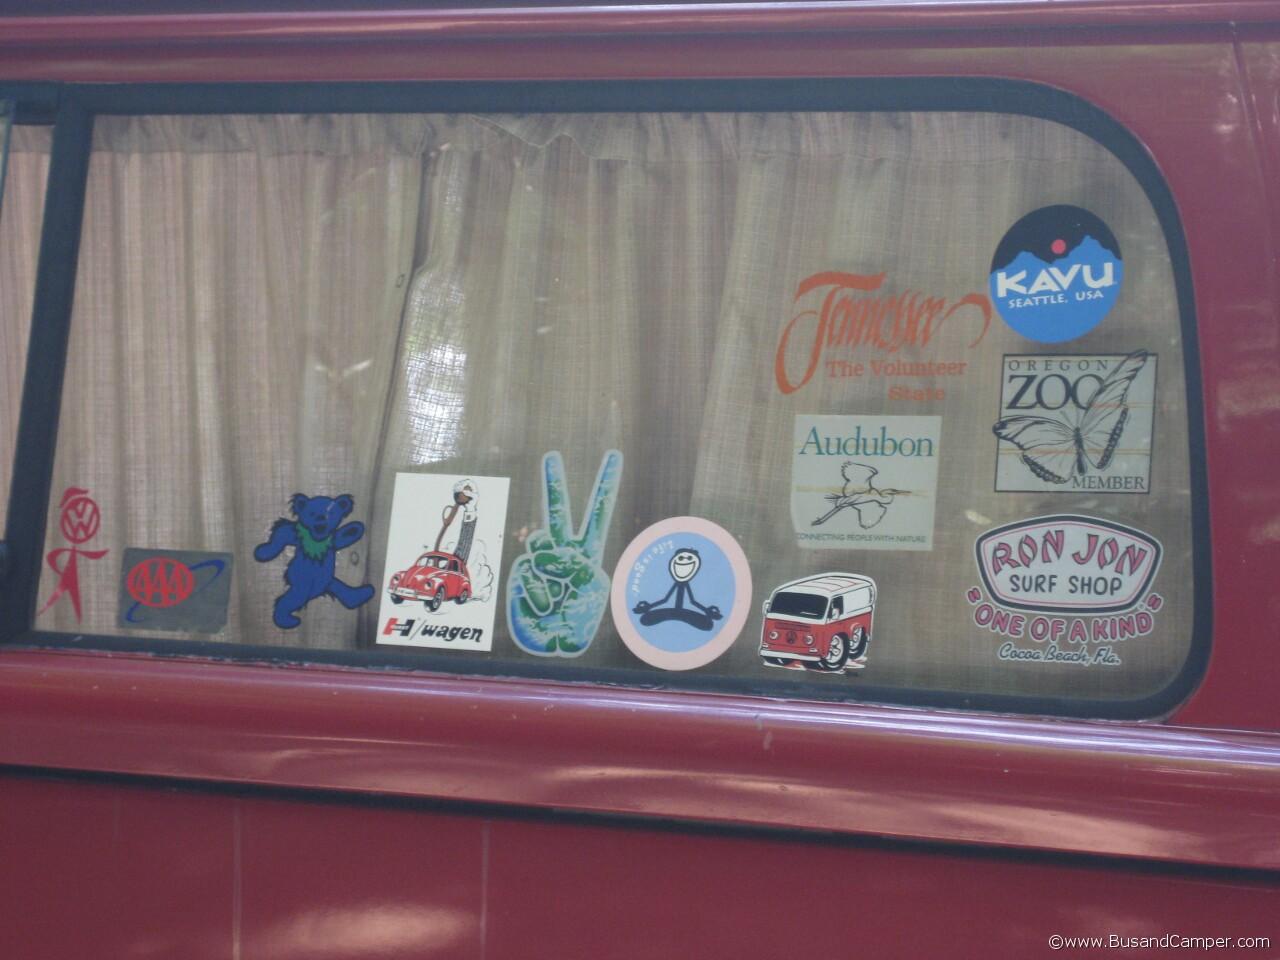 Ron Jon Surf Shop stickers 31